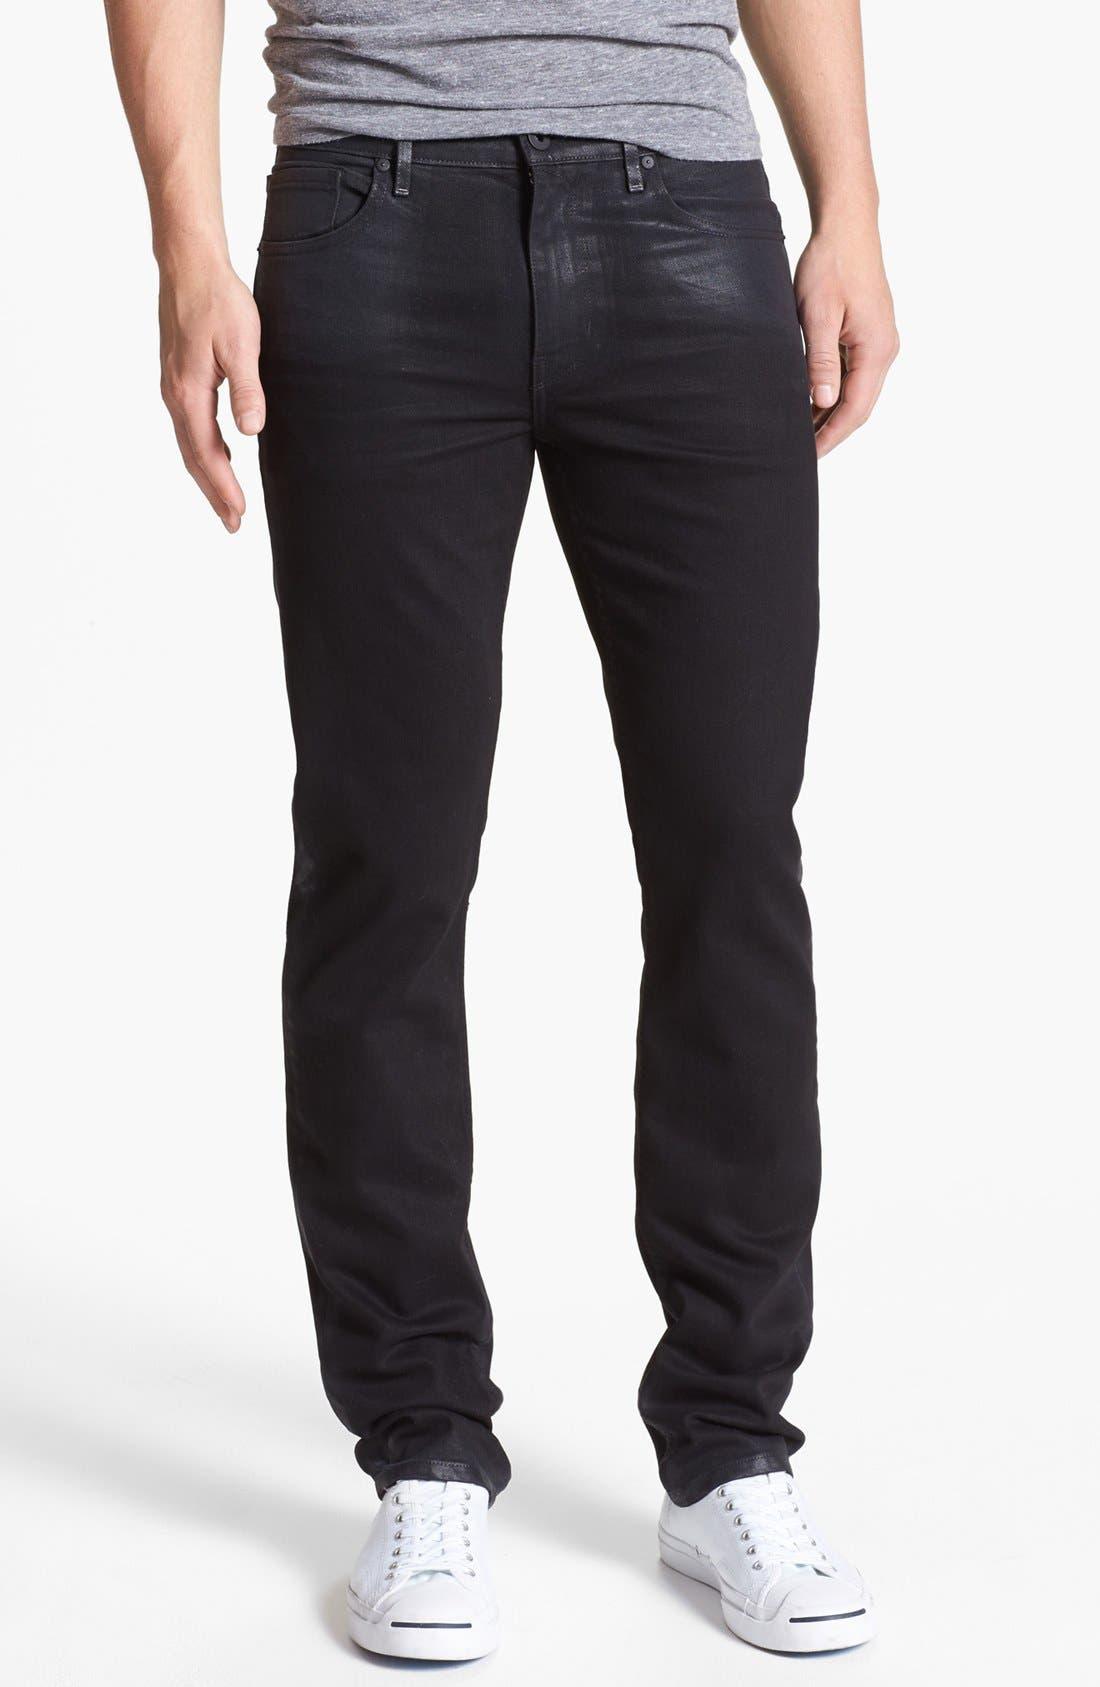 Alternate Image 2  - PAIGE 'Federal' Coated Slim Fit Jeans (Oil Slick)